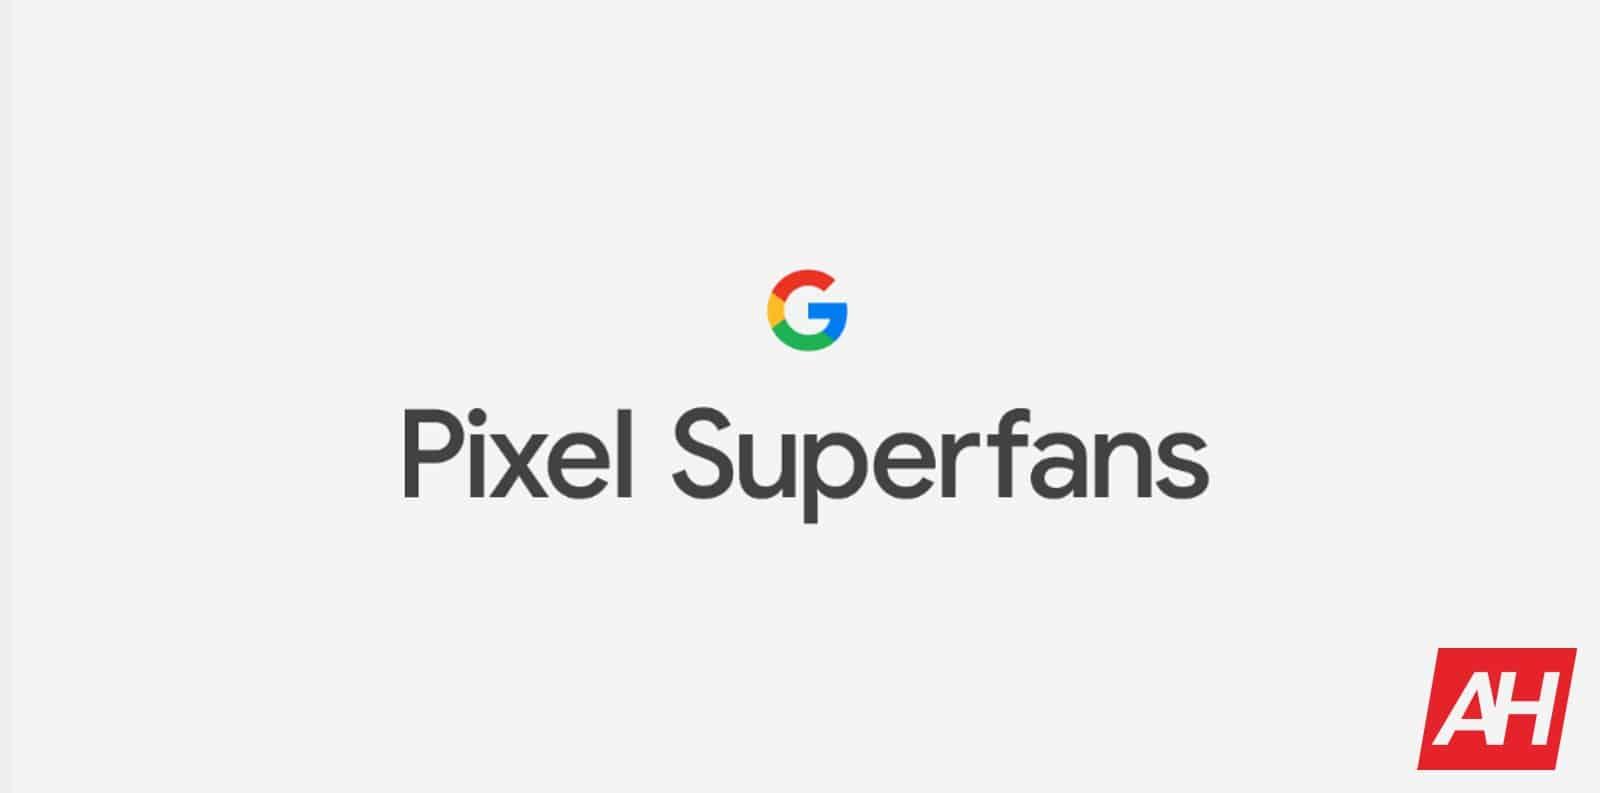 Google Wants Your Help Making Pixel Phones More Useful